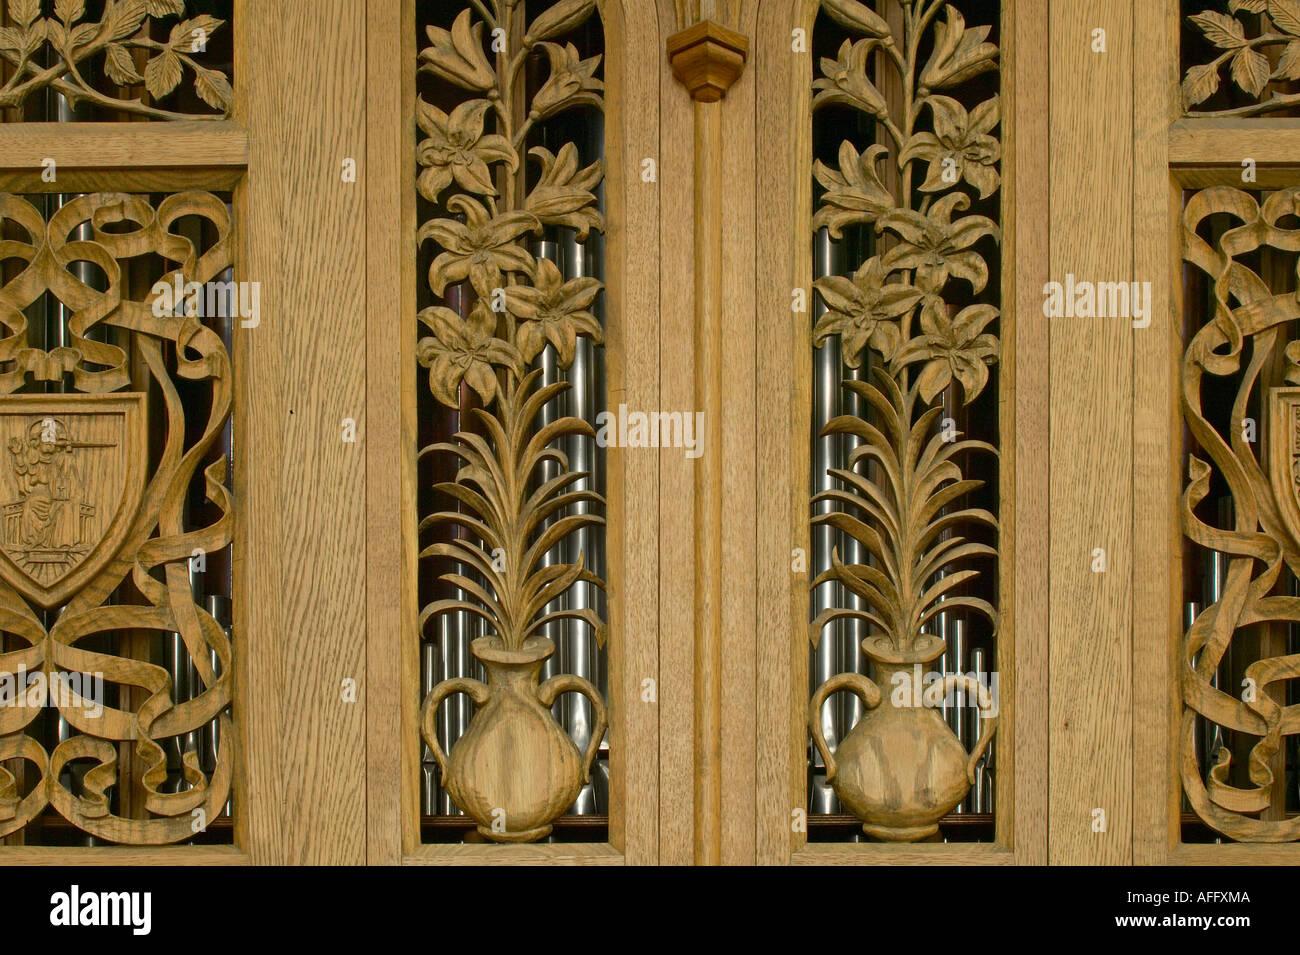 Wooden Carved Panel Imágenes De Stock & Wooden Carved Panel Fotos De ...